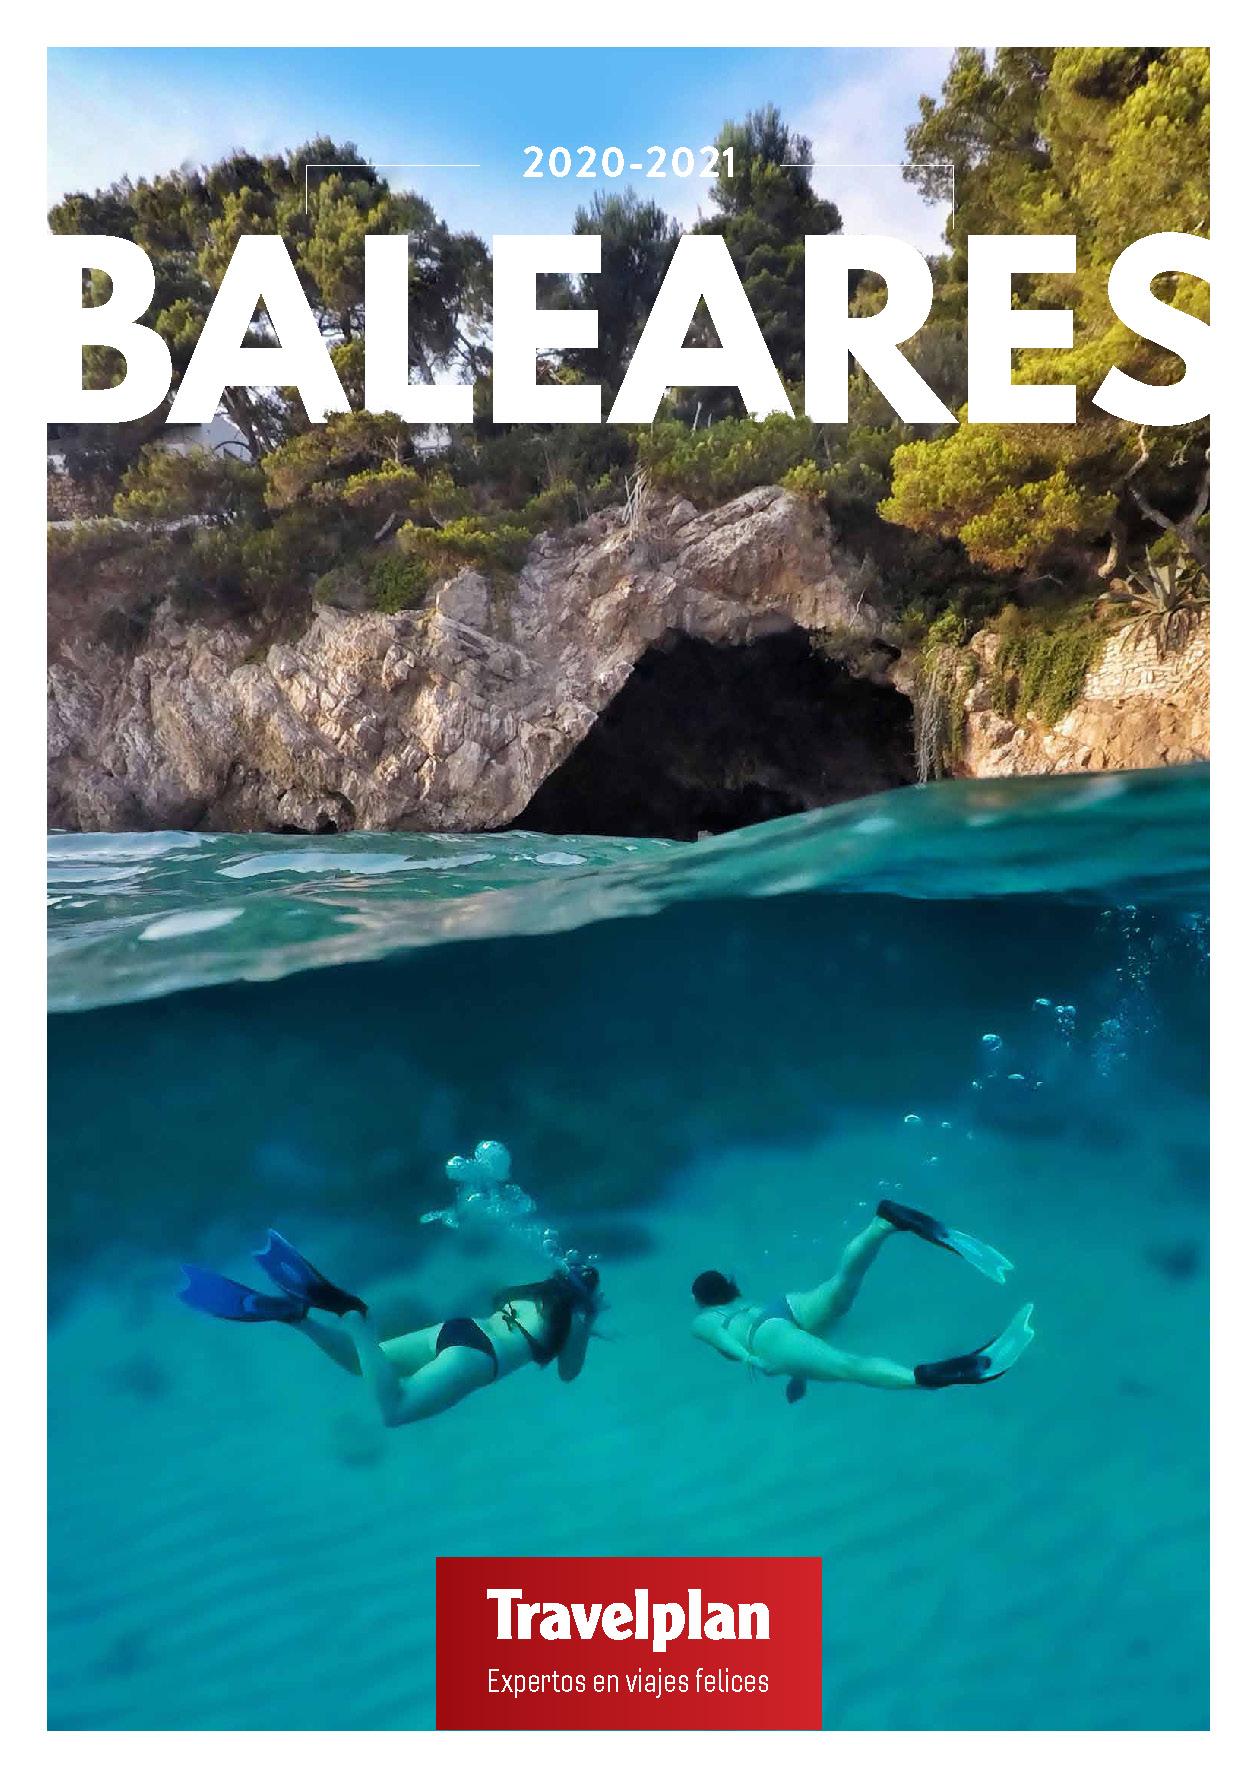 Catalogo Travelplan Baleares 2020-2021